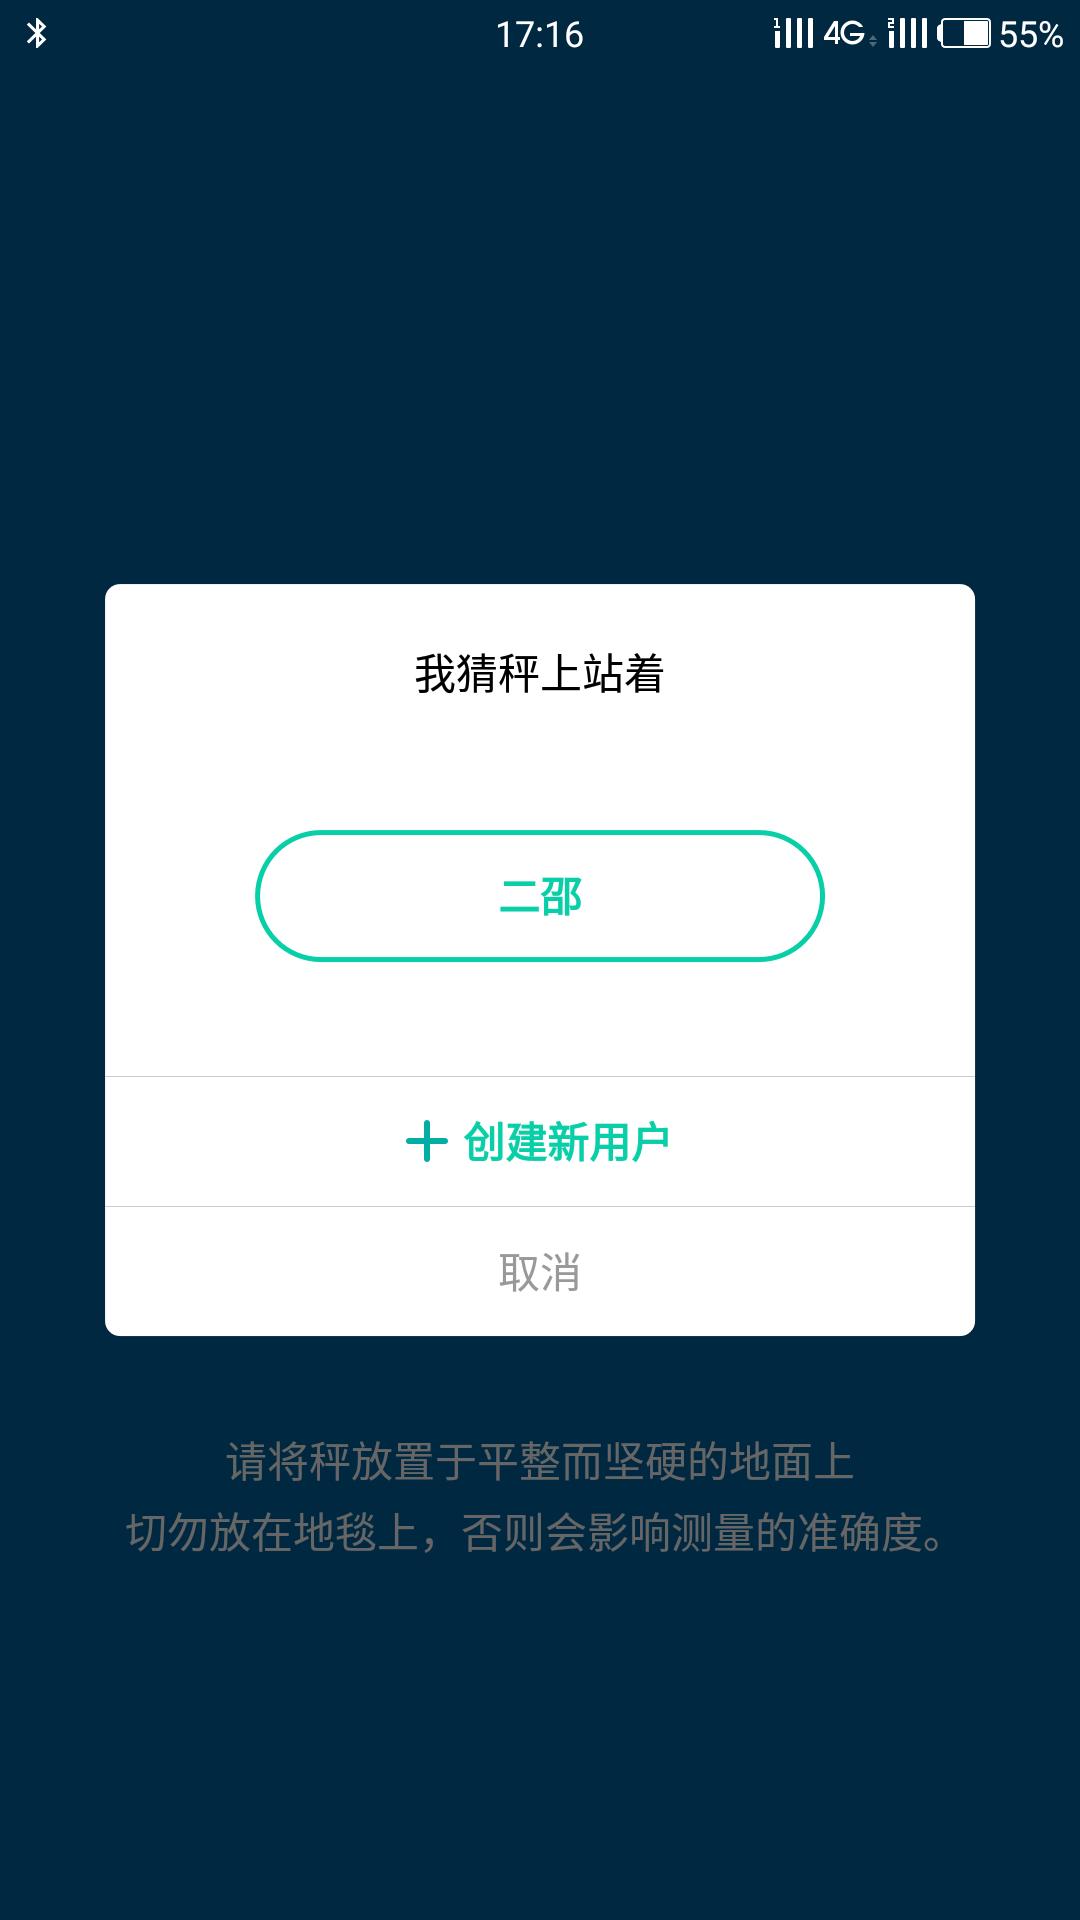 Screenshot_20170111-171639.png